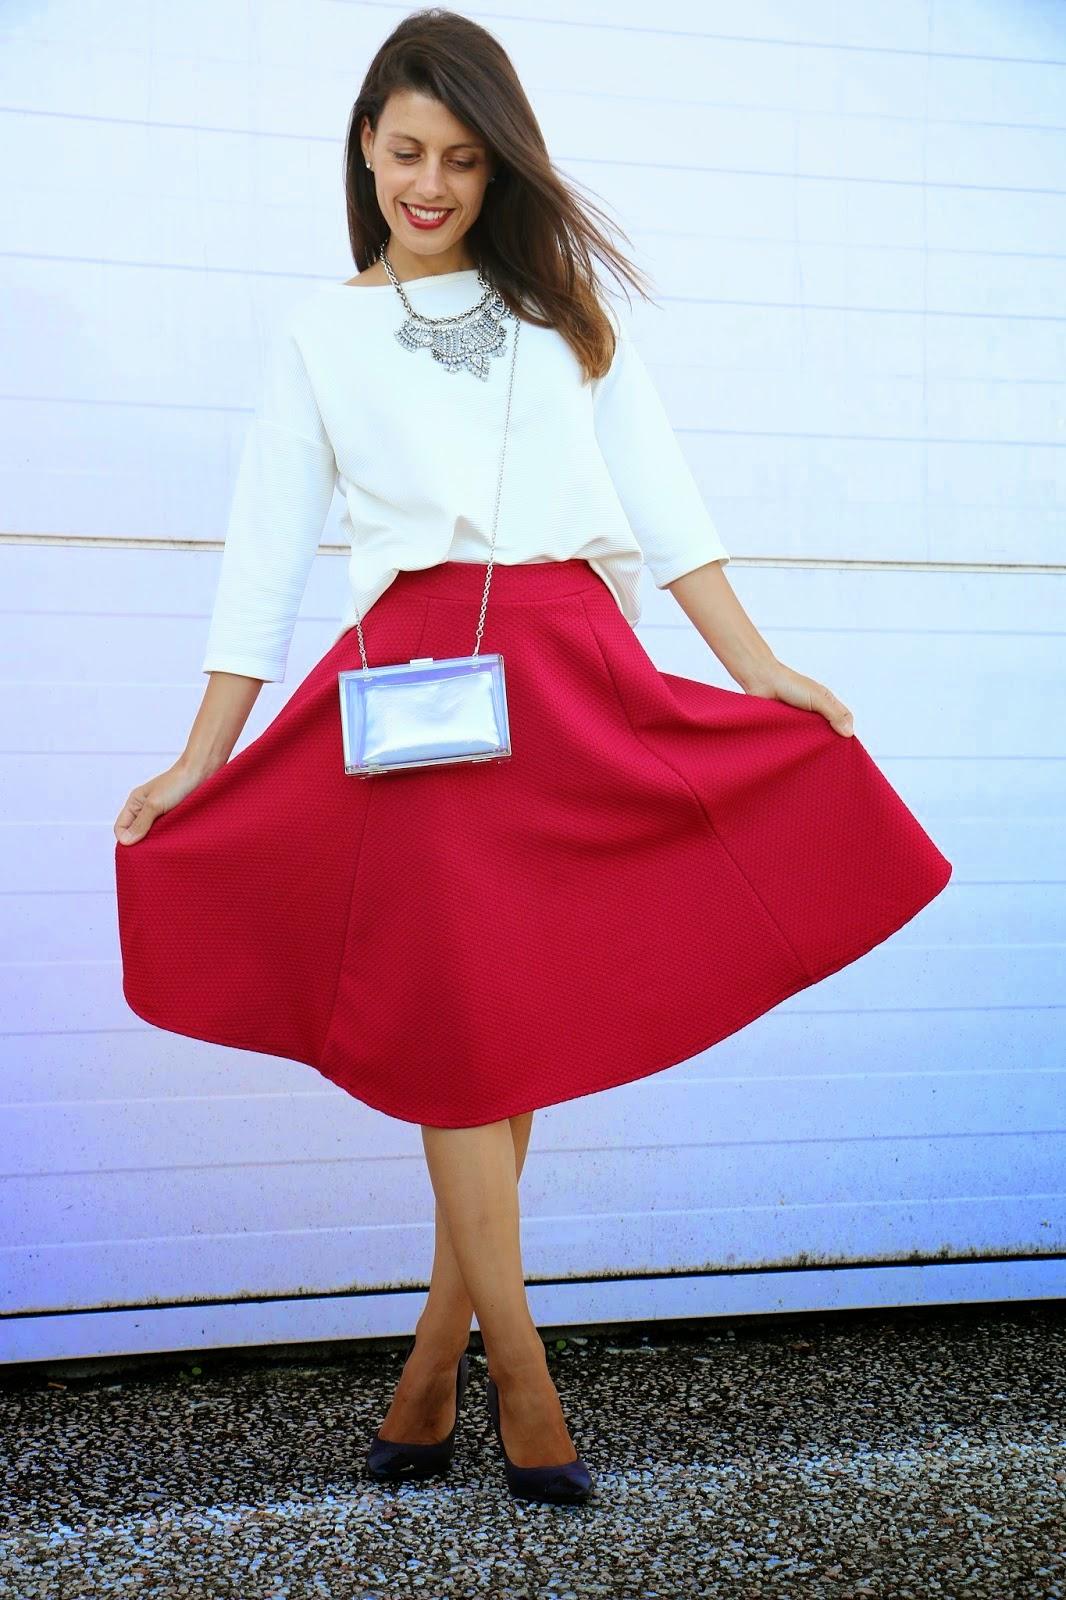 http://ilovefitametrica.blogspot.pt/2014/09/redburgundy-skirt.html